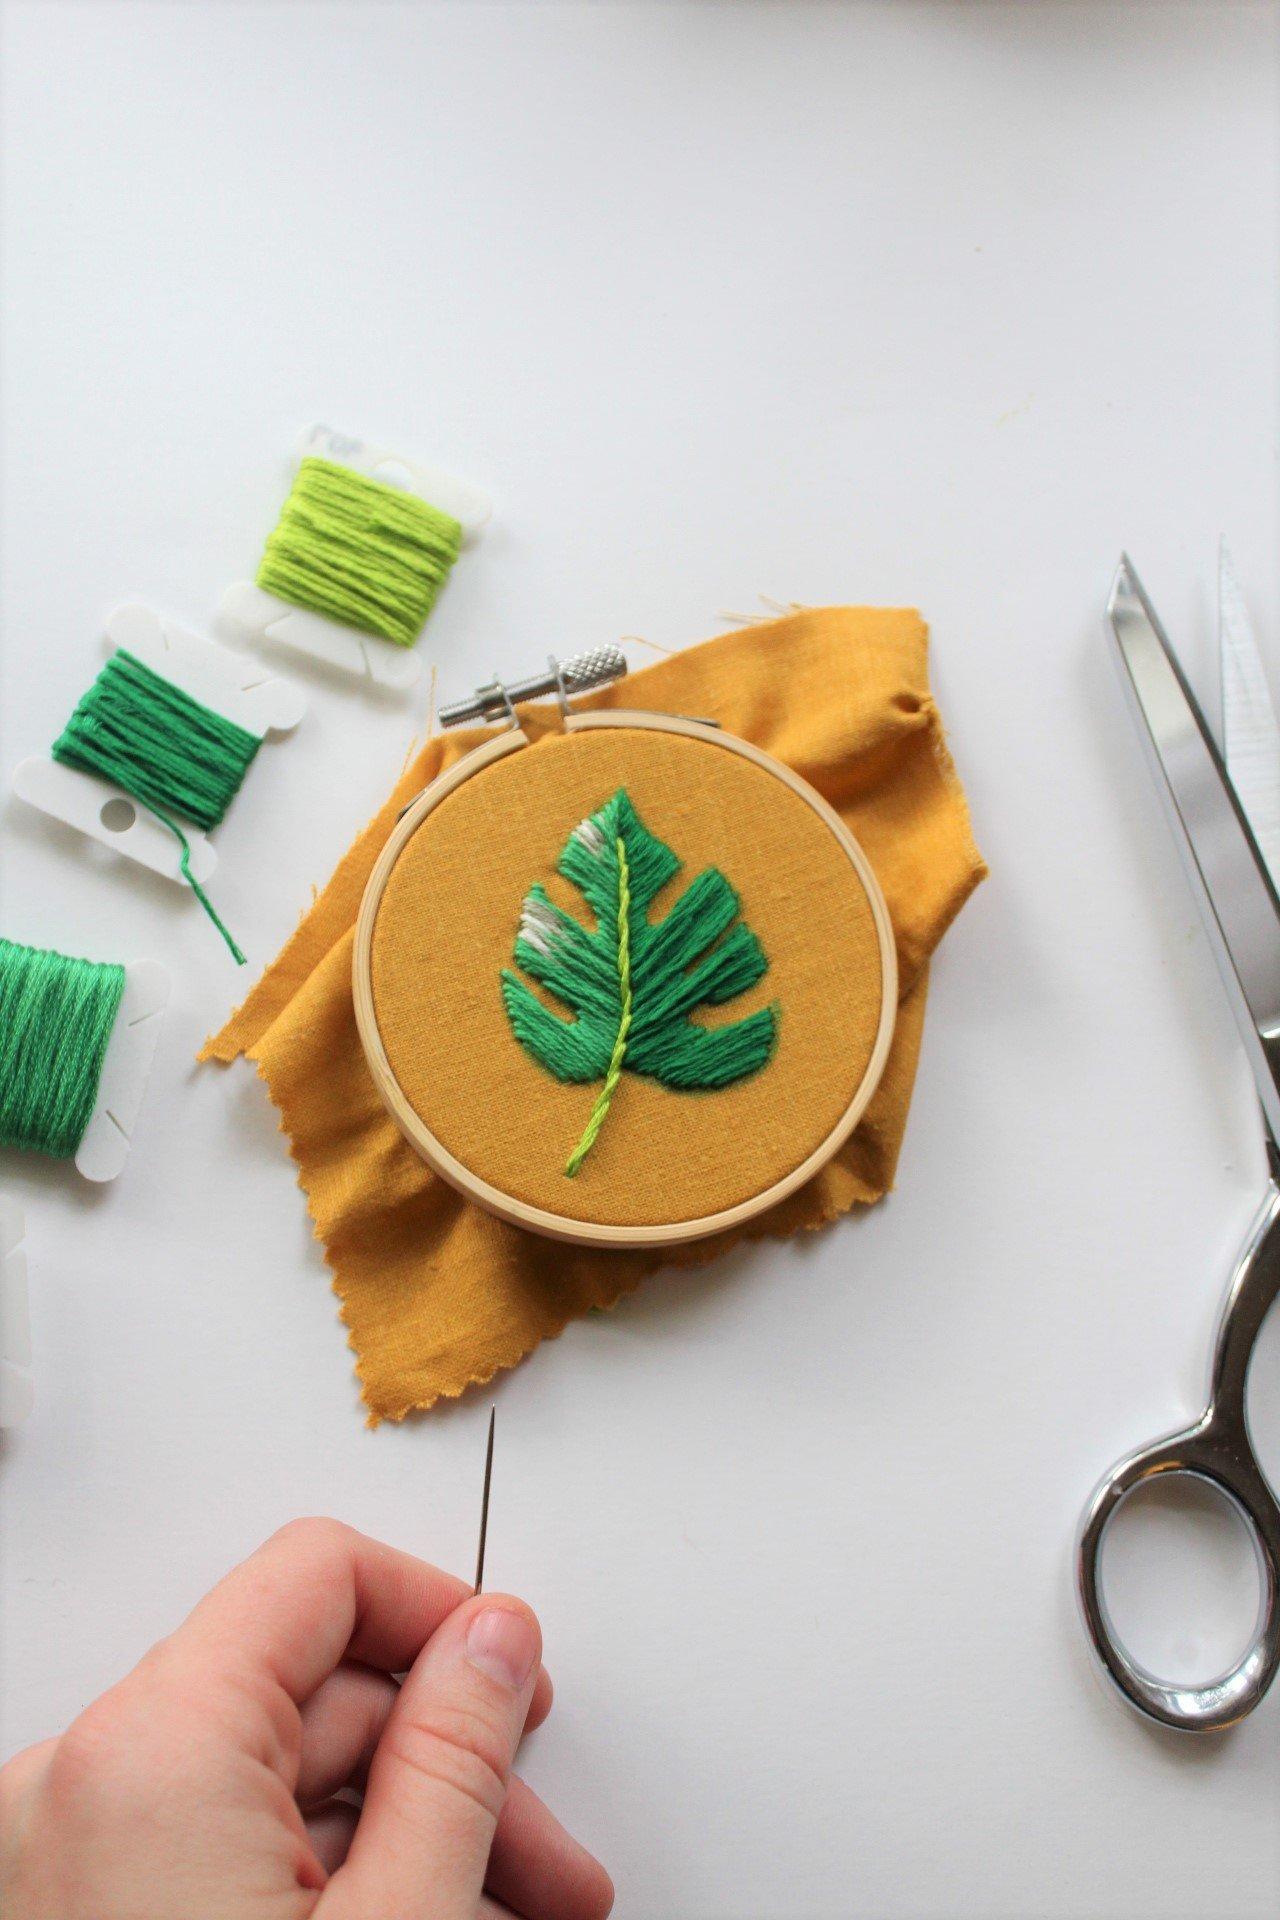 Embroidery Tutorial – Stitch a Monstera Leaf